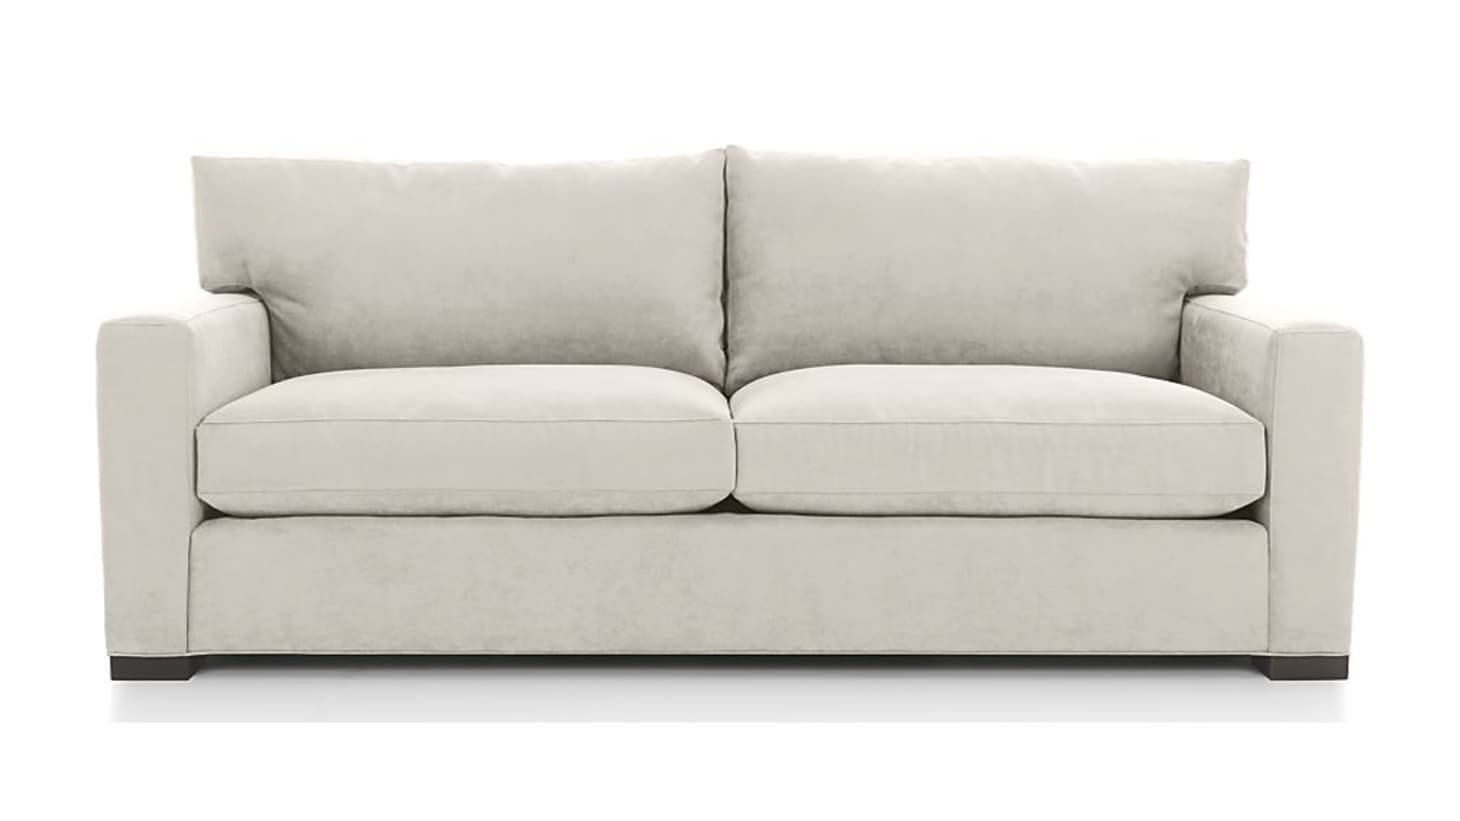 Awesome Reviewed The Most Comfortable Sofas At Crate Barrel Inzonedesignstudio Interior Chair Design Inzonedesignstudiocom